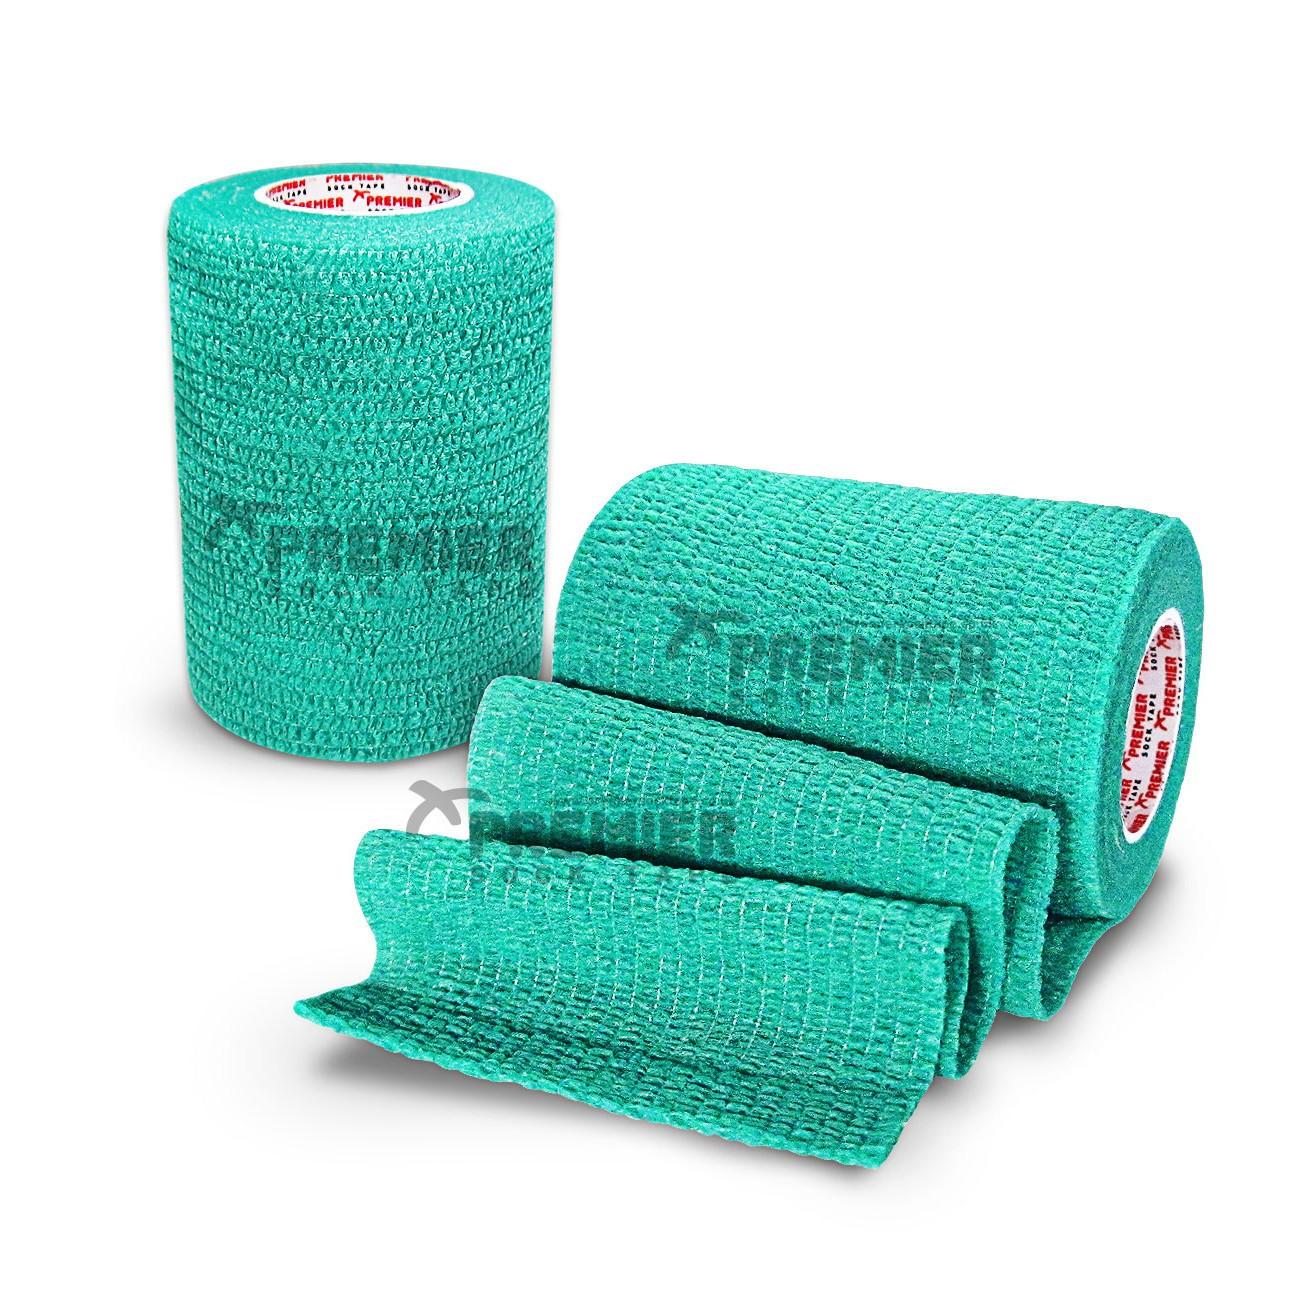 Premier Sock Tape Pro-Wrap 7.5cm - Turquoise Green